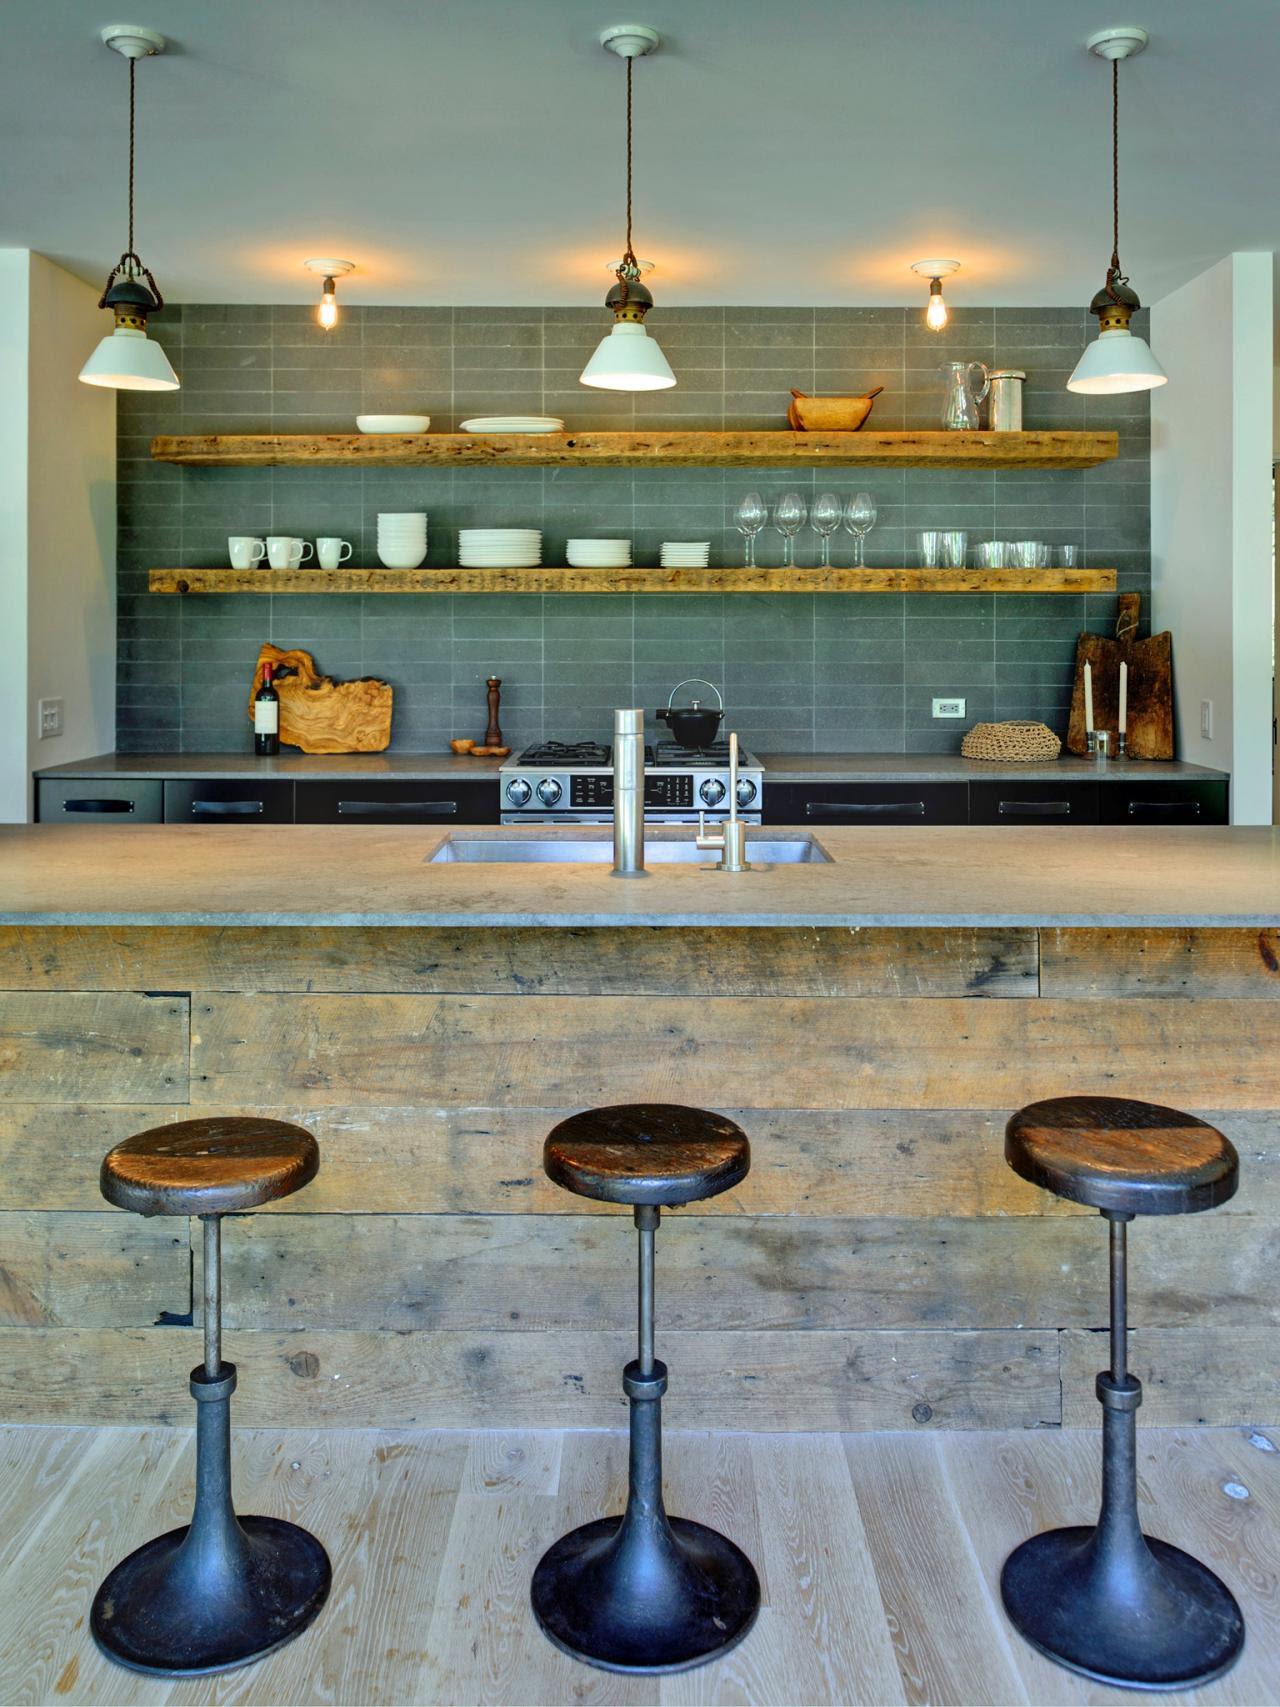 Inexpensive Kitchen Backsplash Ideas + Pictures From HGTV ...